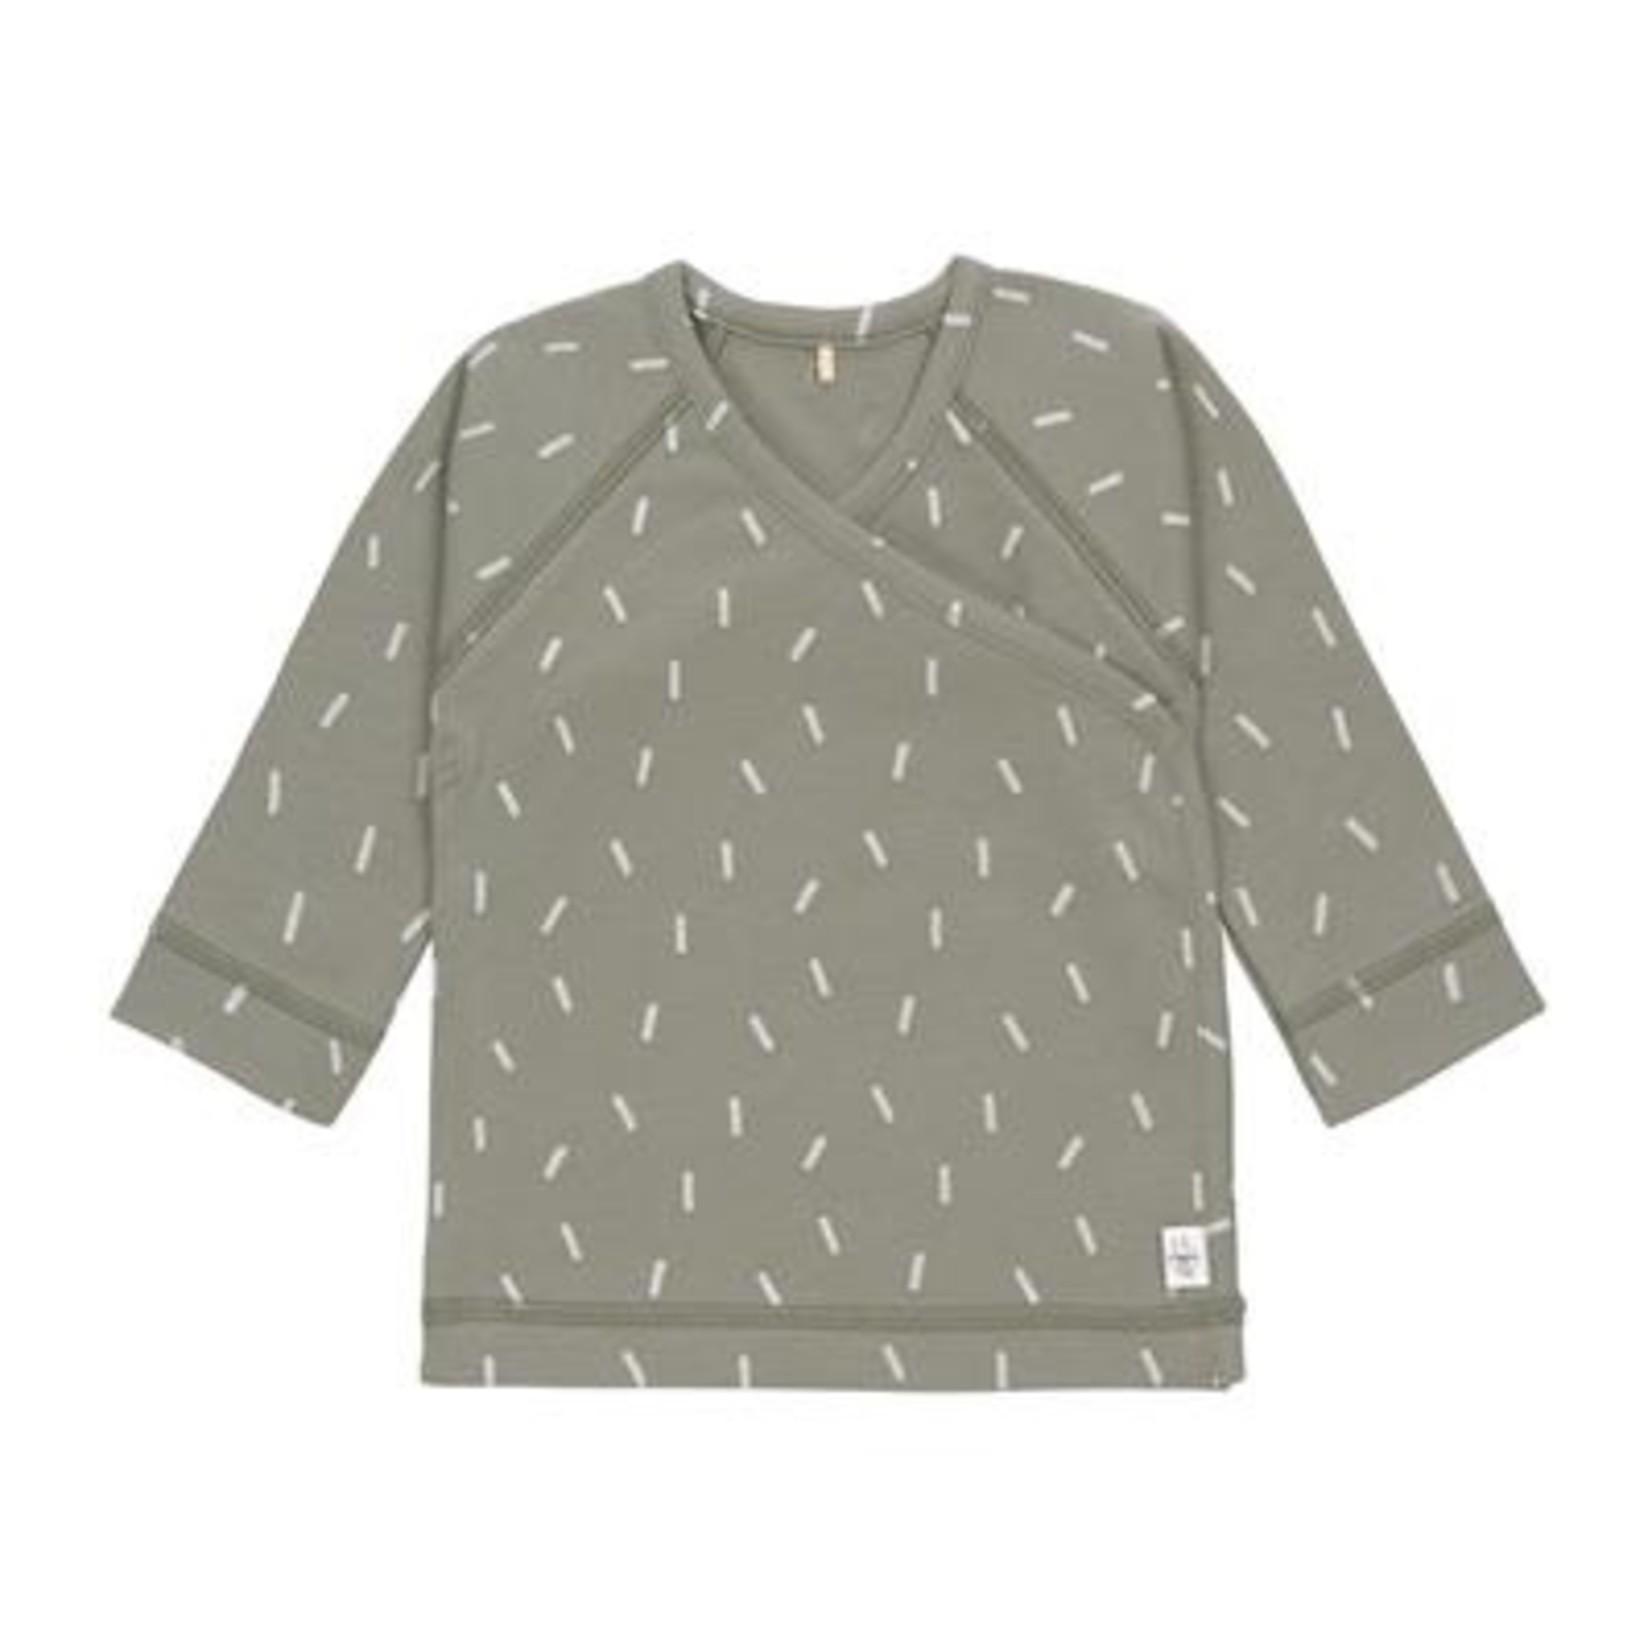 Lässig Lässig Kimono Shirt Gots Speckles Olive